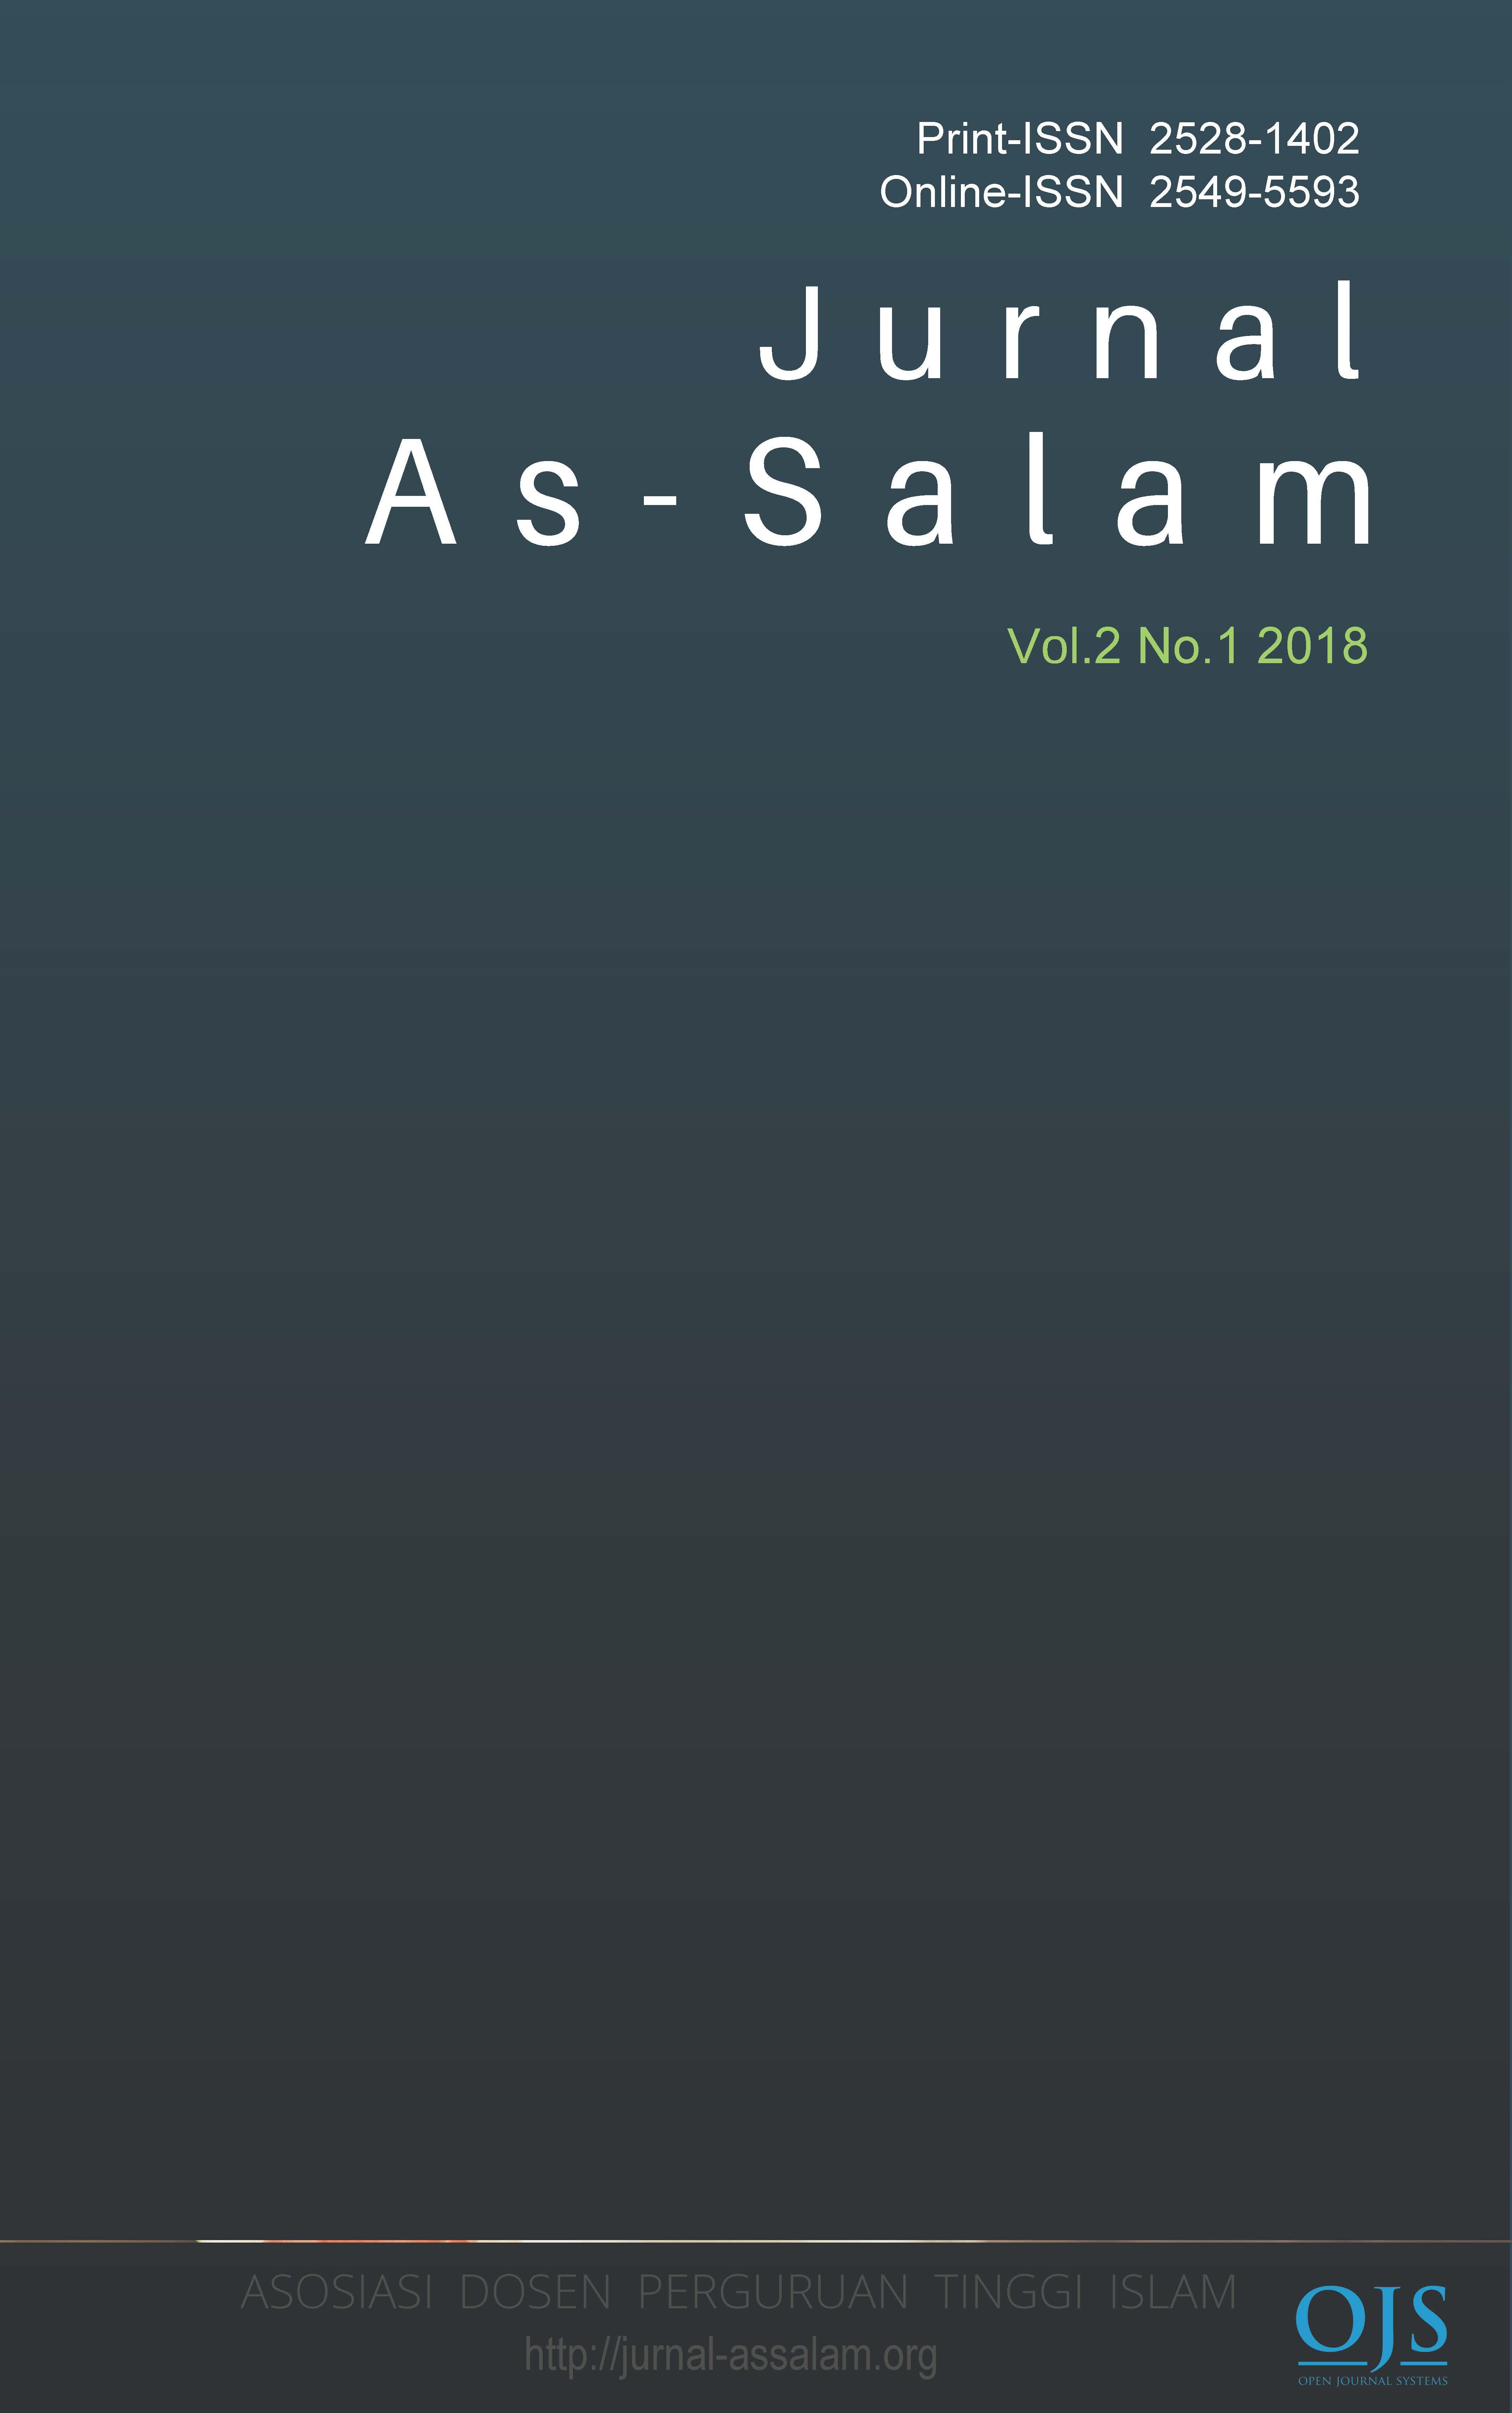 View Vol. 2 No. 1 (2018): Jurnal As-Salam